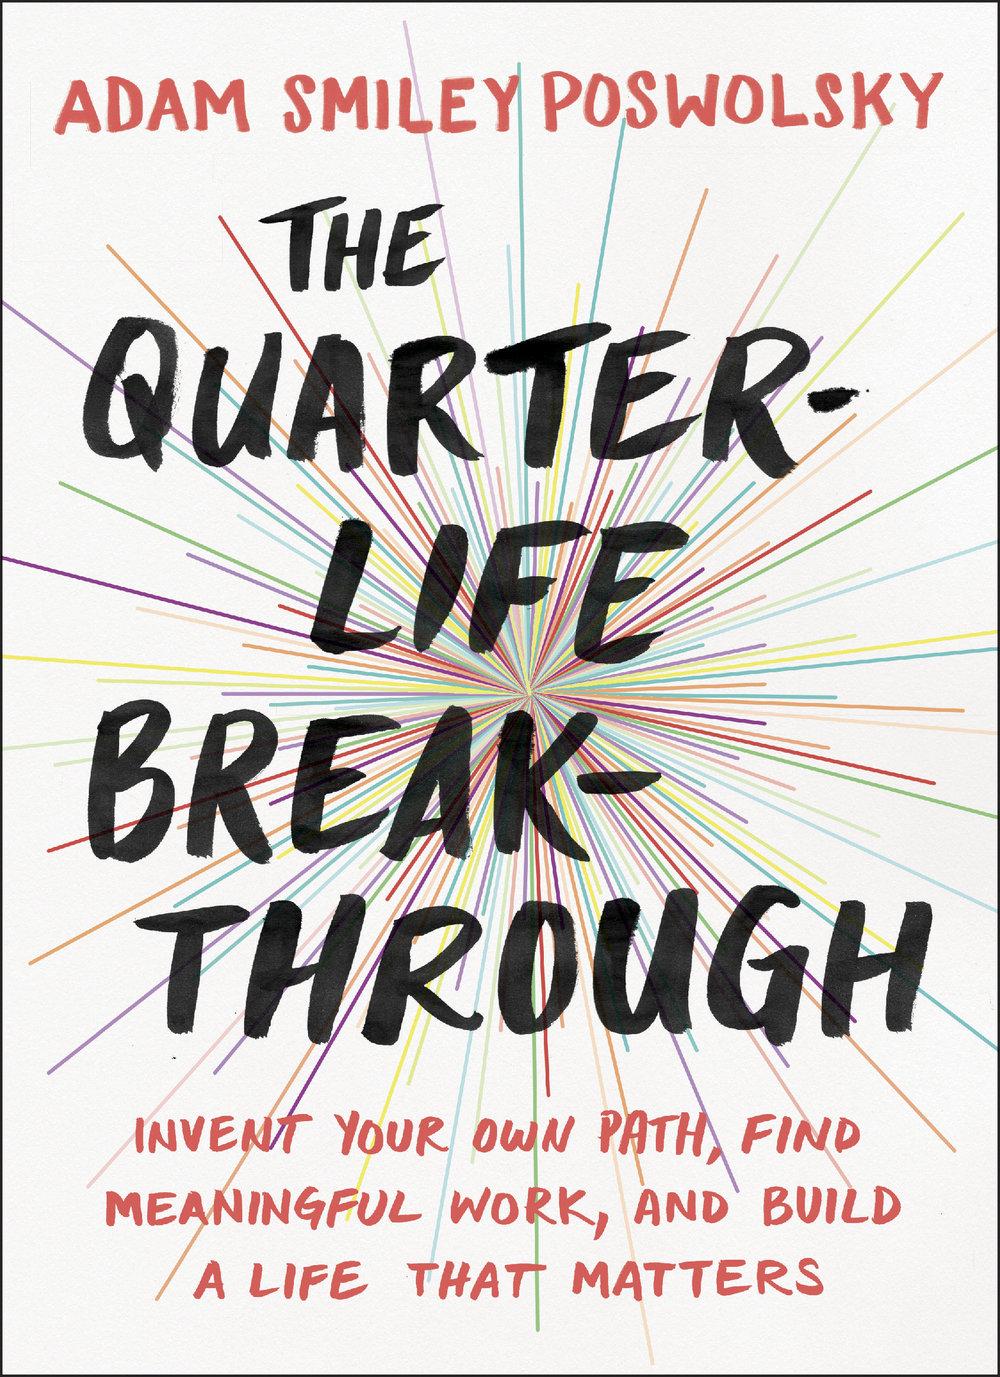 Book cover_QuarterLifeBreakthrough 2016_Adam Smiley Poswolsky.jpg